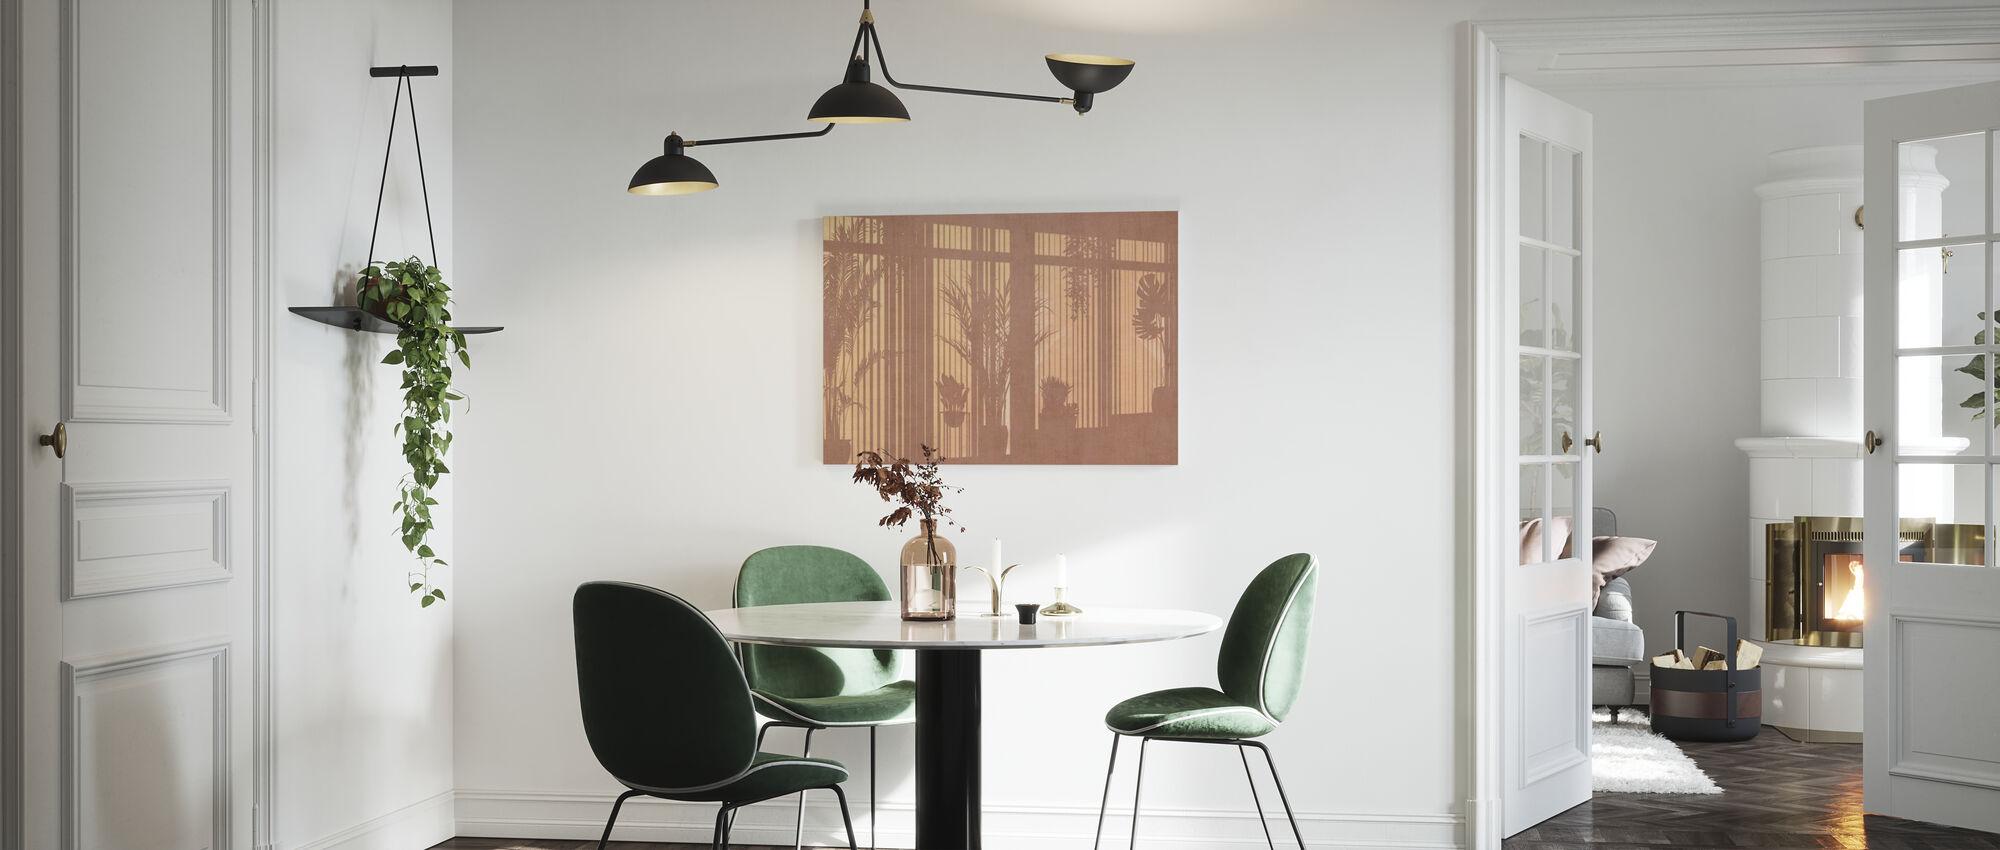 Sunny Window - Tangerine - Canvas print - Kitchen